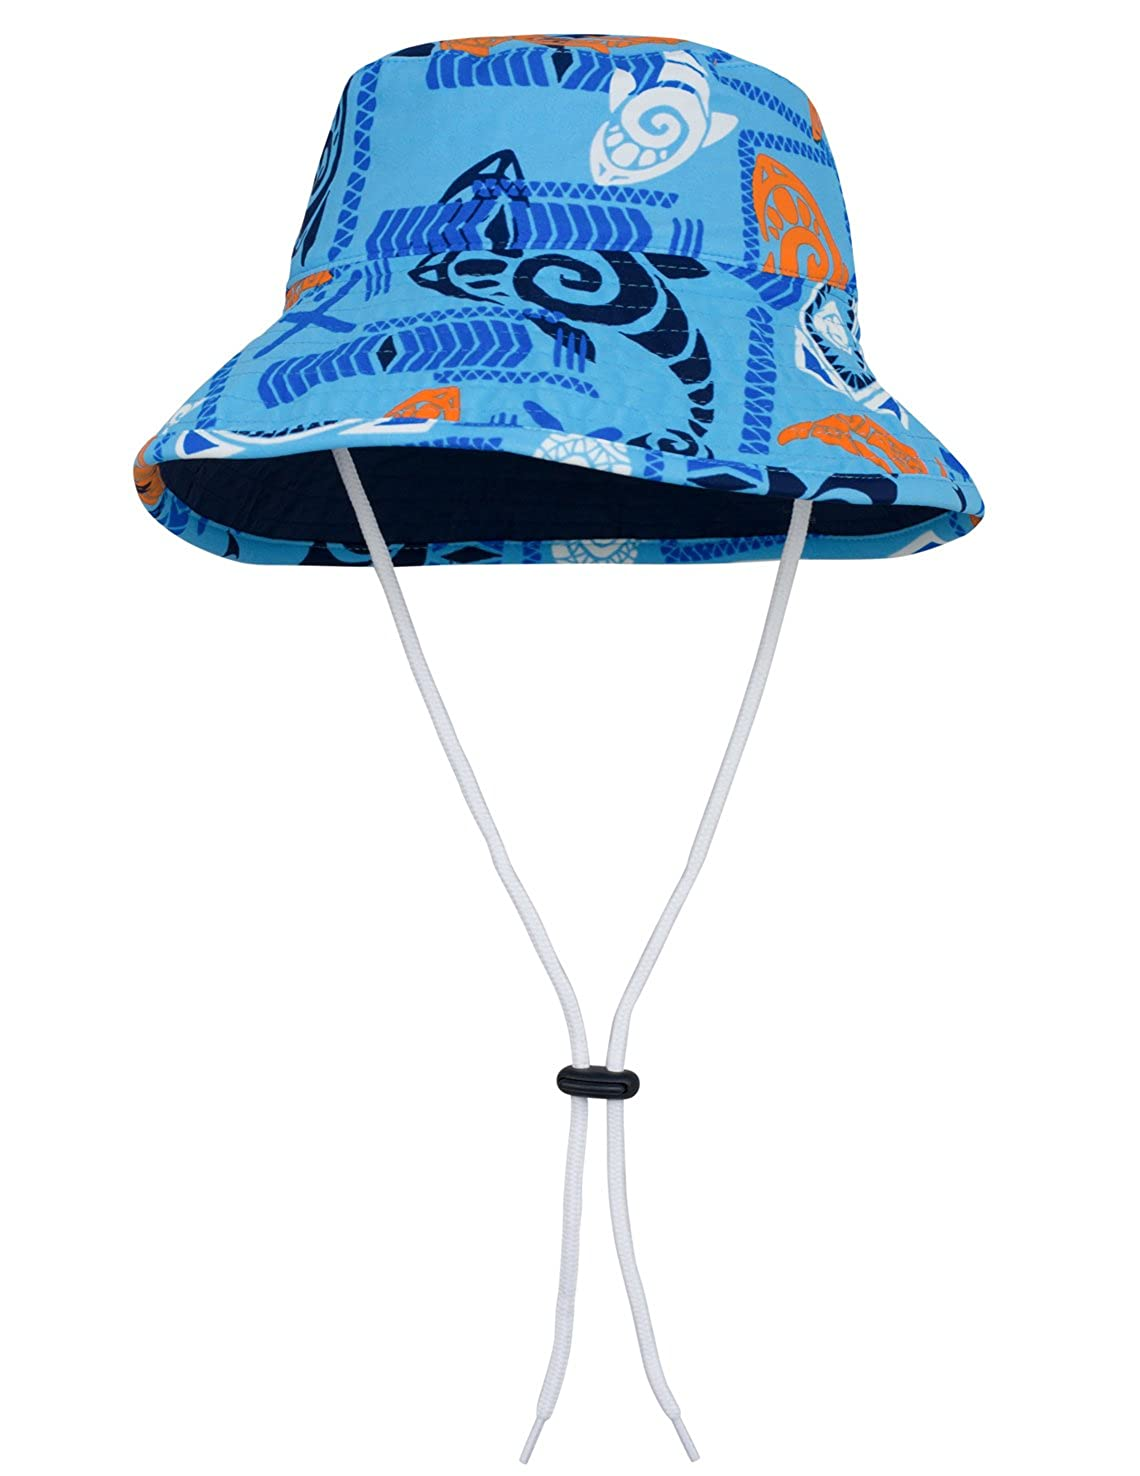 Tuga Boys UV Reversible Bucket Hat 2-10 Years - UPF50+ Sun Protection (Royal/Navy, Leatherneck Blue, Loggerhead Red & Surf Blue)